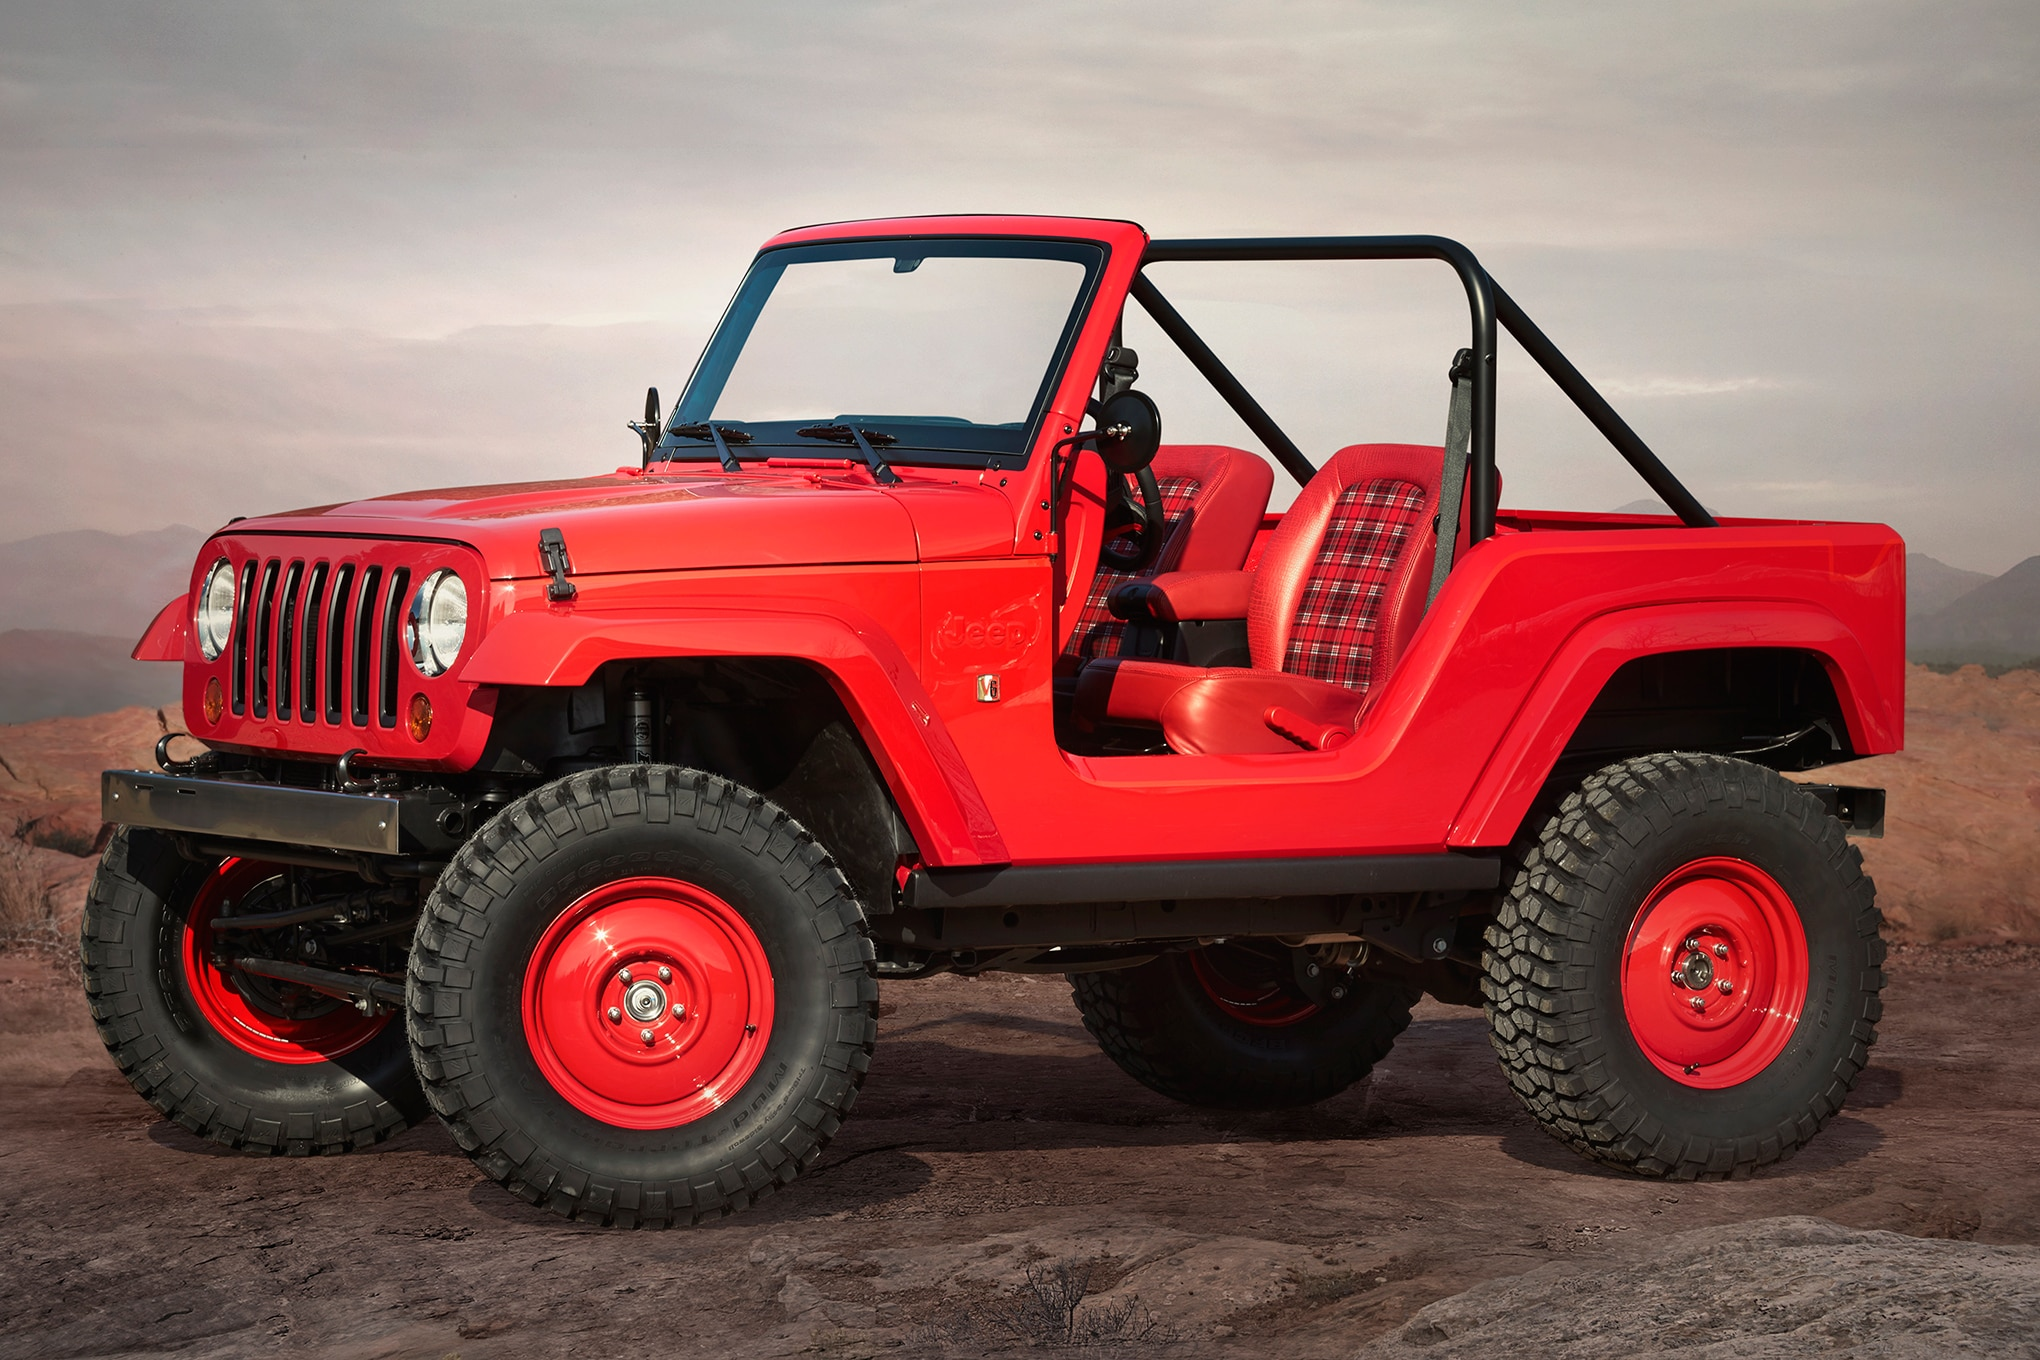 014 auto news jp jeep easter jeep safari moab 2016 mopar concept shortcut